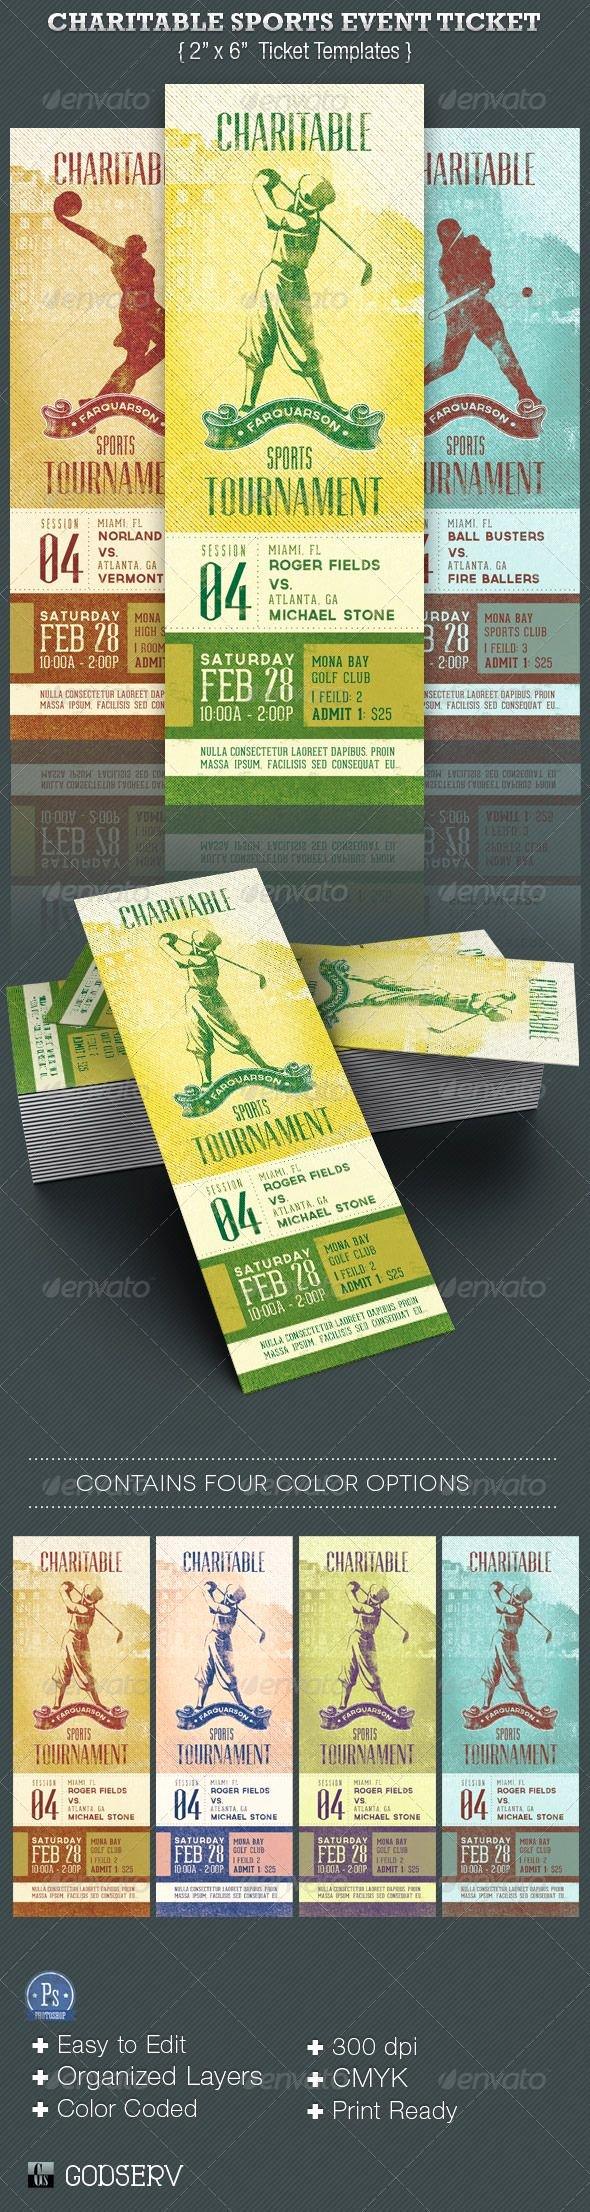 Event Ticket Template Free Elegant Best 25 event Tickets Ideas On Pinterest